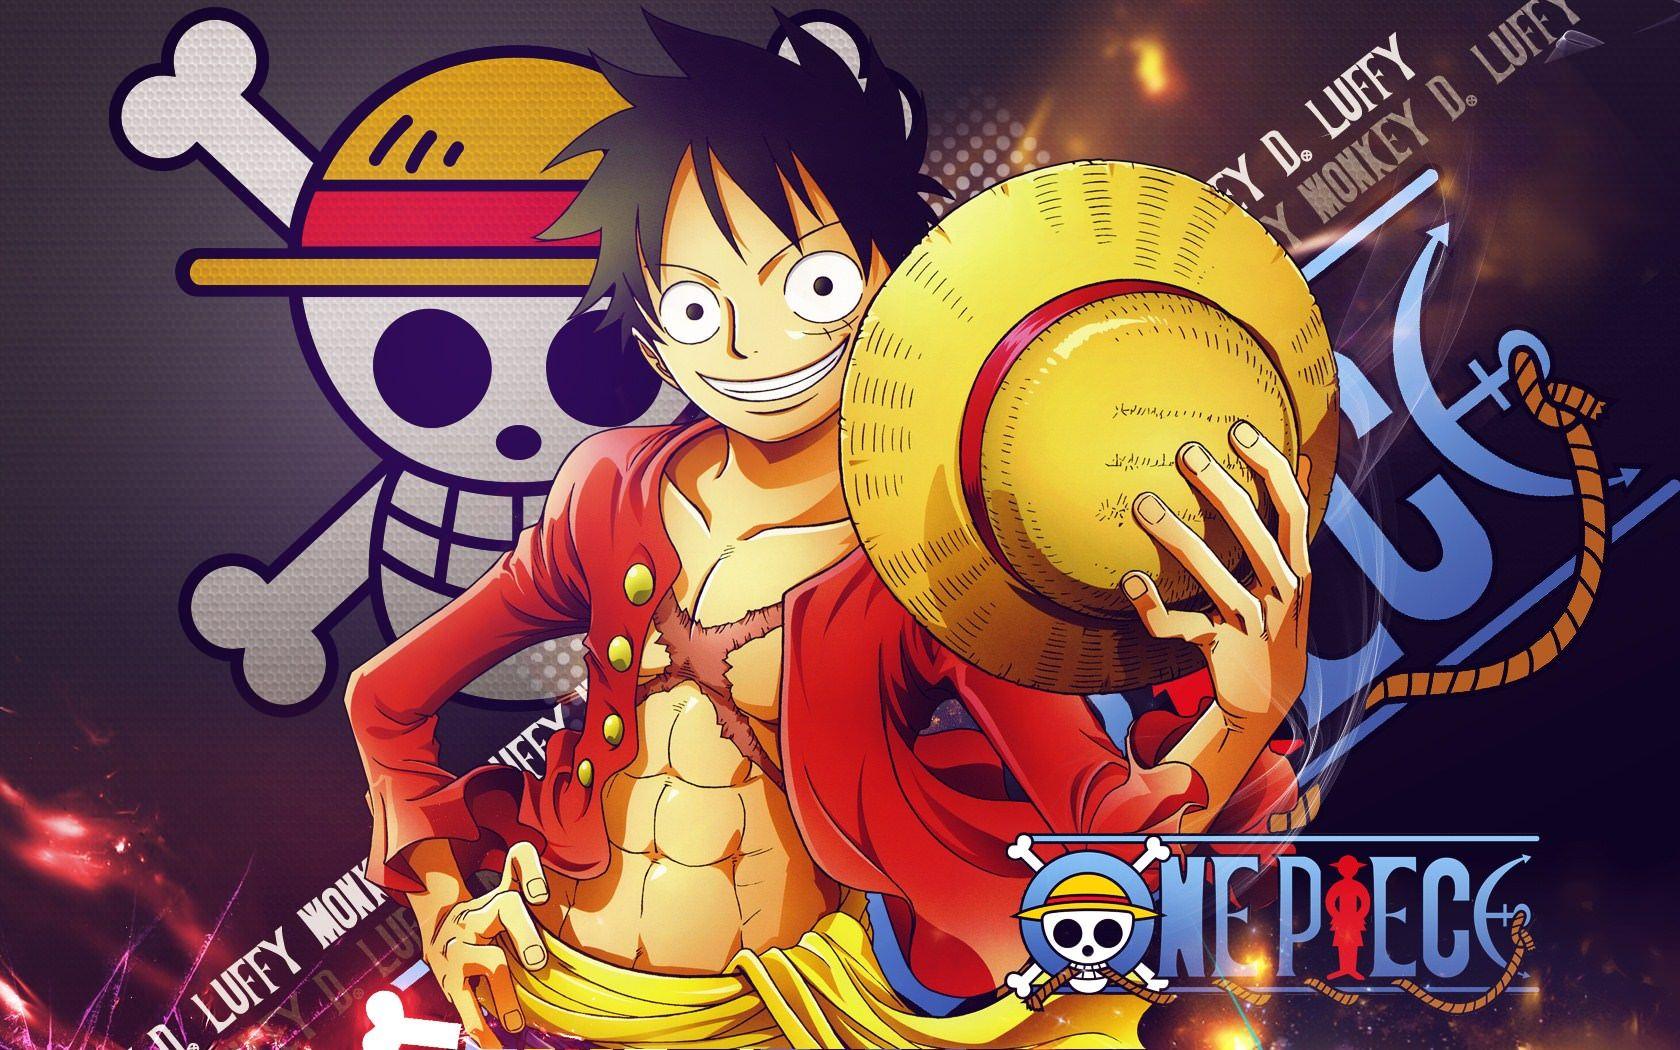 One Piece VF ~ Gum Gum Streaming | Orry manga | Pinterest | Manga ...